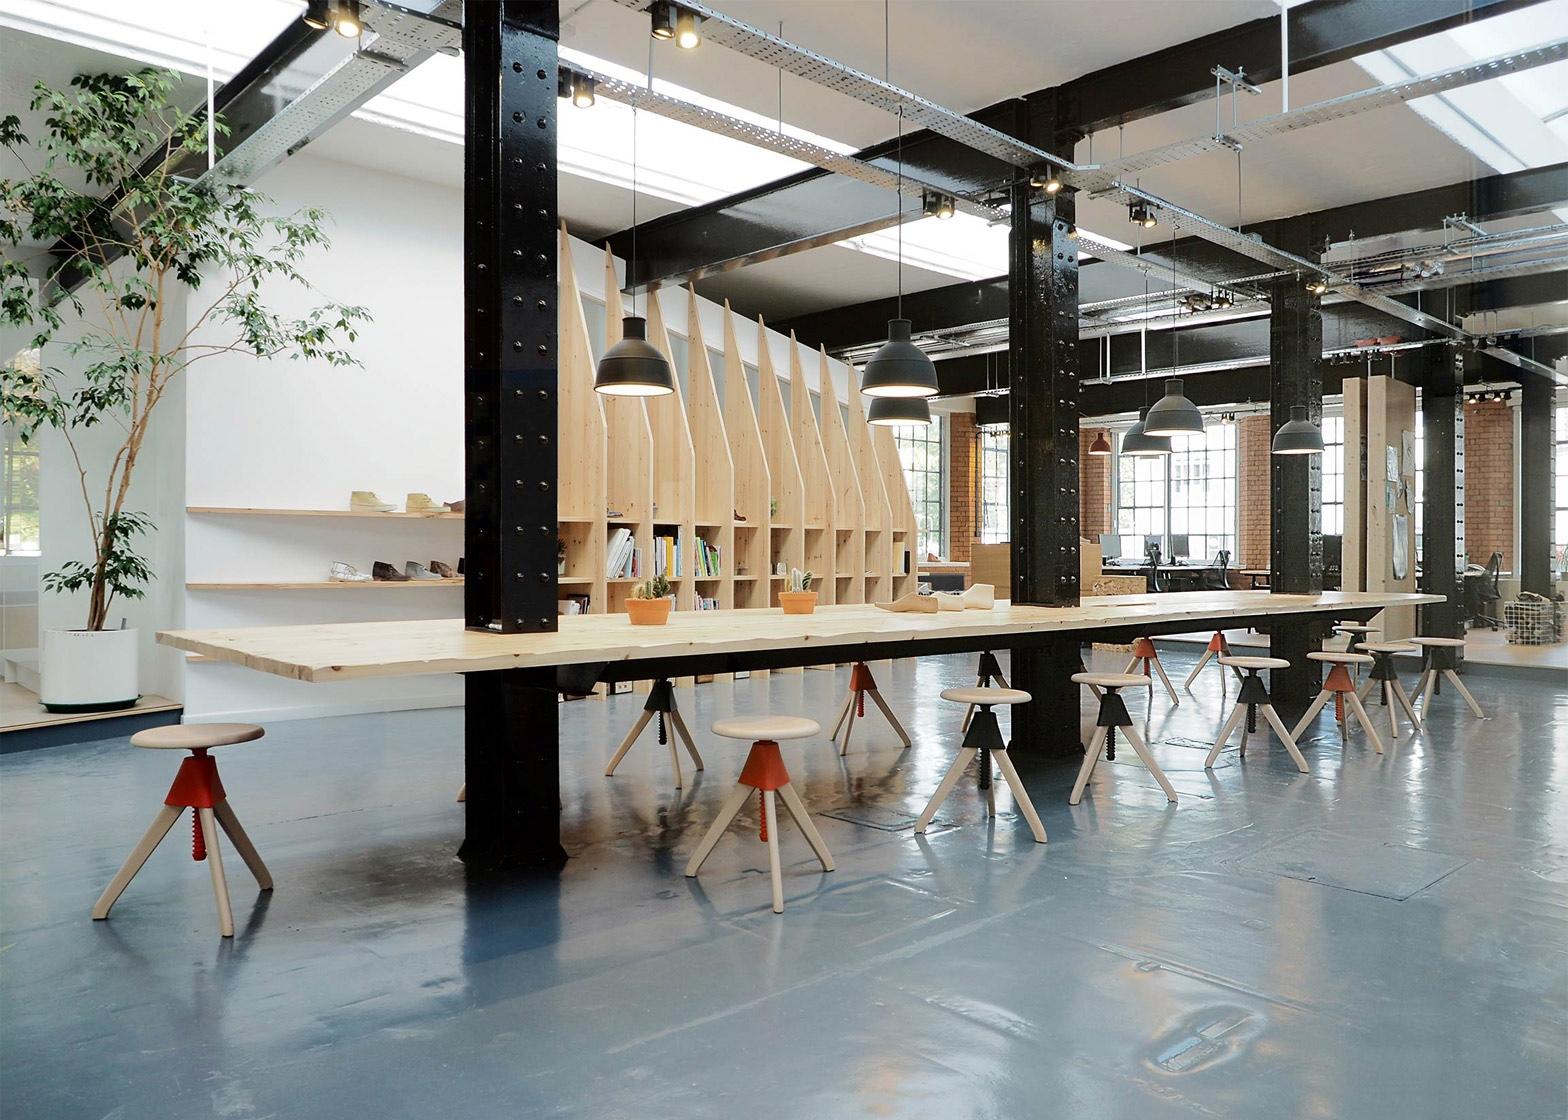 Paris-based ARRO Studio transformed a 19th-centurywarehouseinto a modishdesign studio fortrustedBritishshoebrand Clarks. Image via Dezeen.